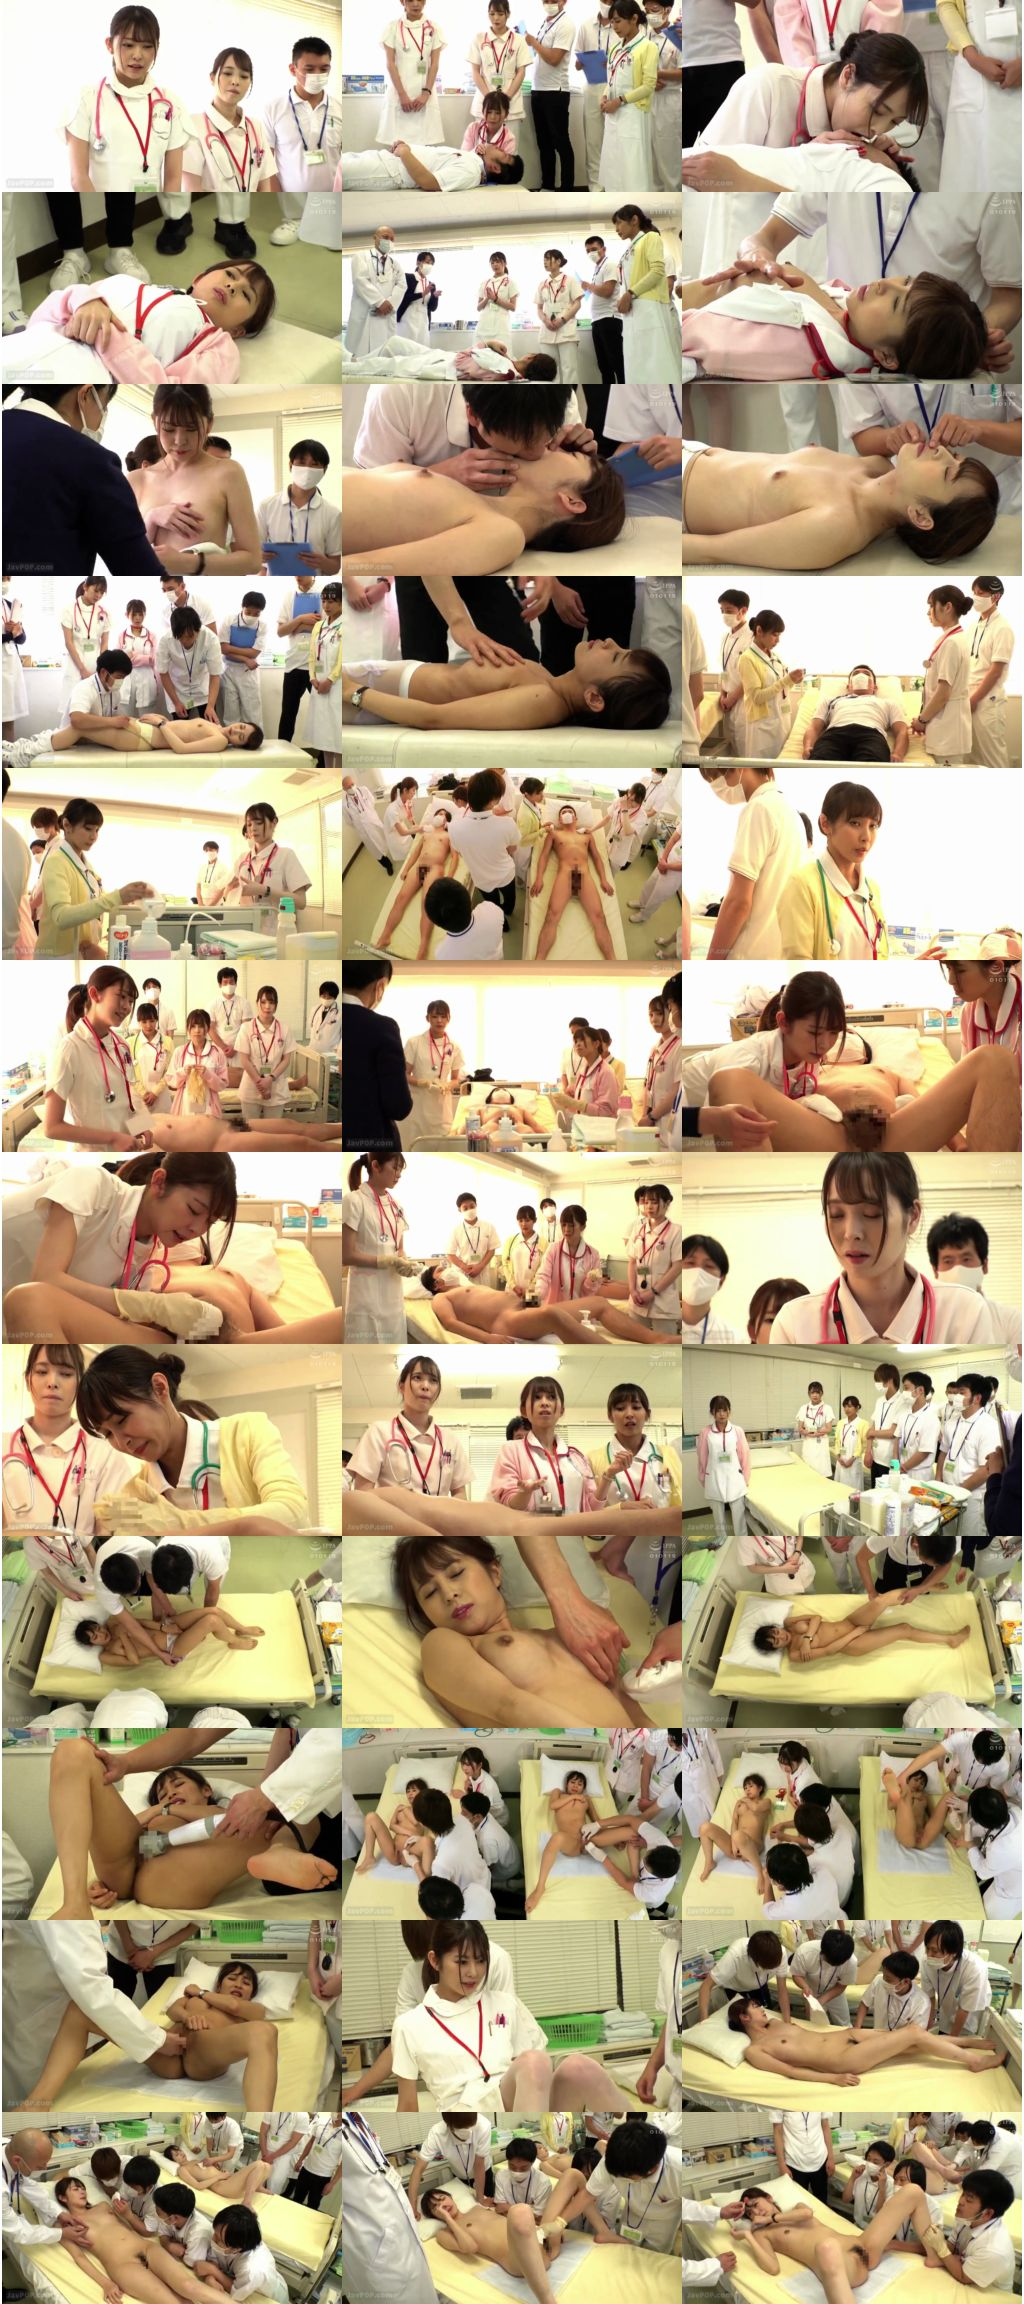 svdvd 858 0 s - [SVDVD-858] 羞恥 生徒同士が男女とも全裸献体になって実技指導を行う質の高い授業を実践する看護学校実習2021 潮吹き IST サディスティックヴィレッジ Humiliation Morinichi Hinako